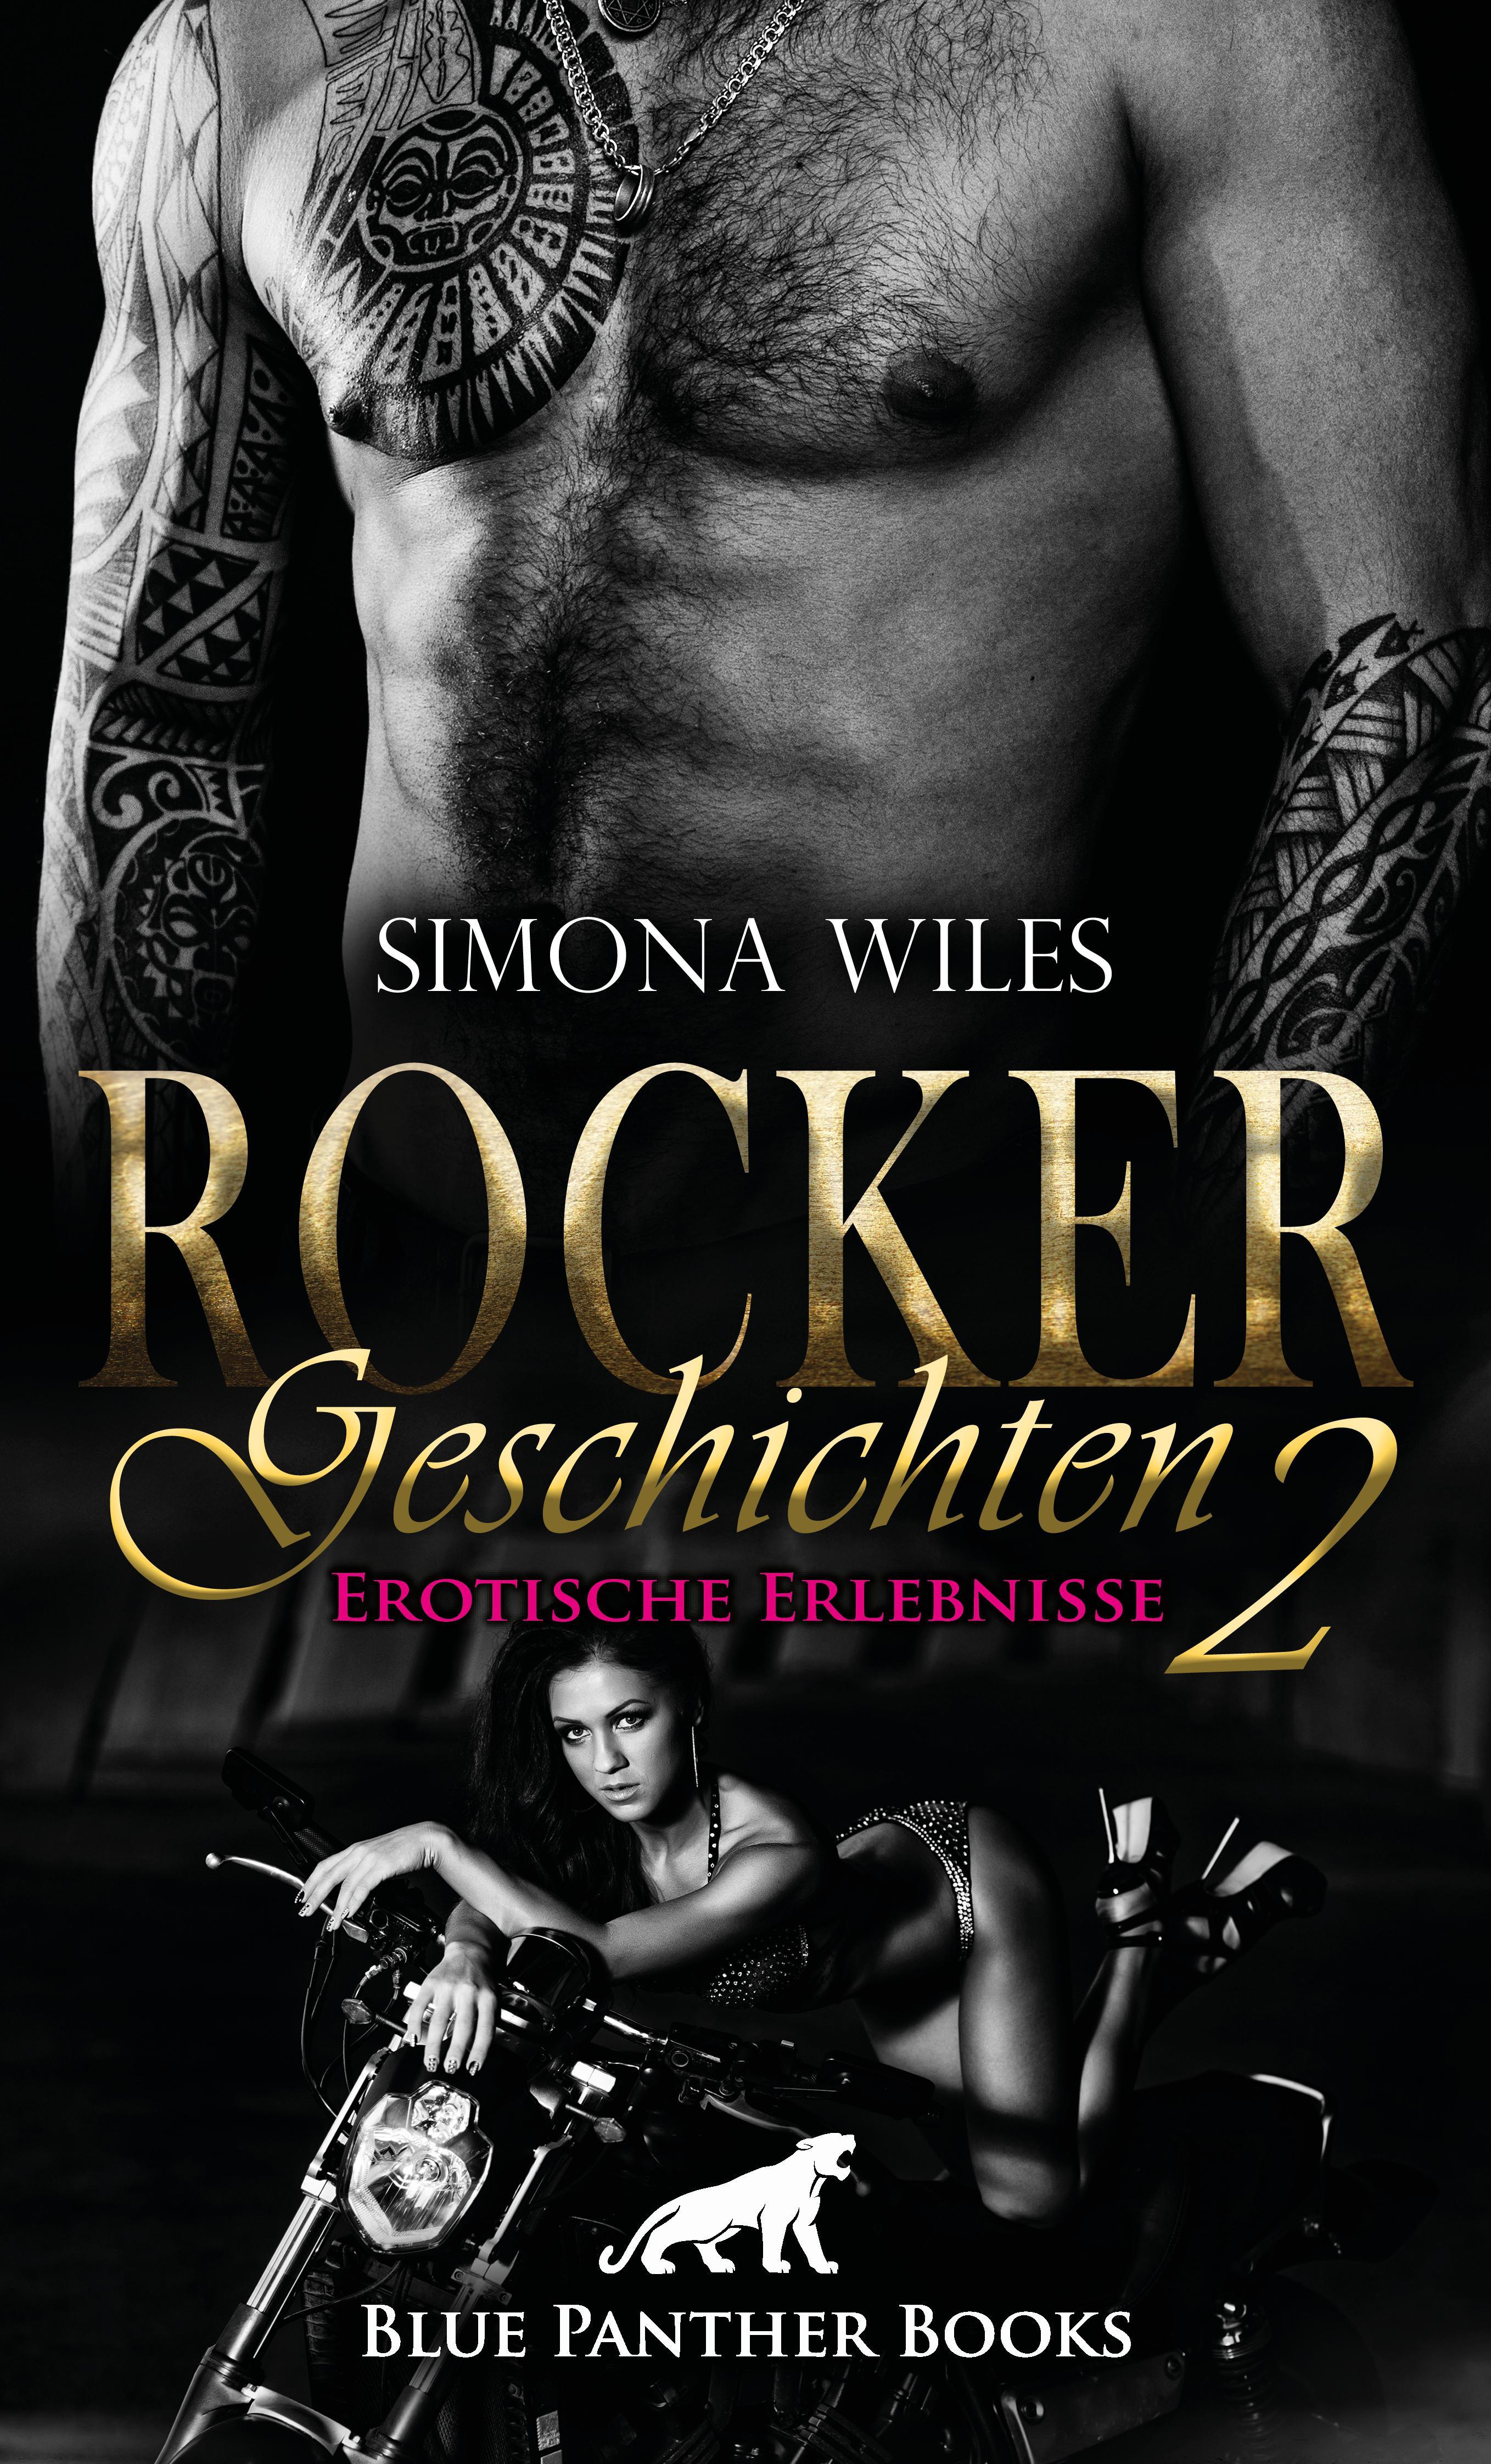 Simona Wiles Rocker Geschichten 2 | Erotische Erlebnisse charlotte habersack jungs sind keine regenschirme cd